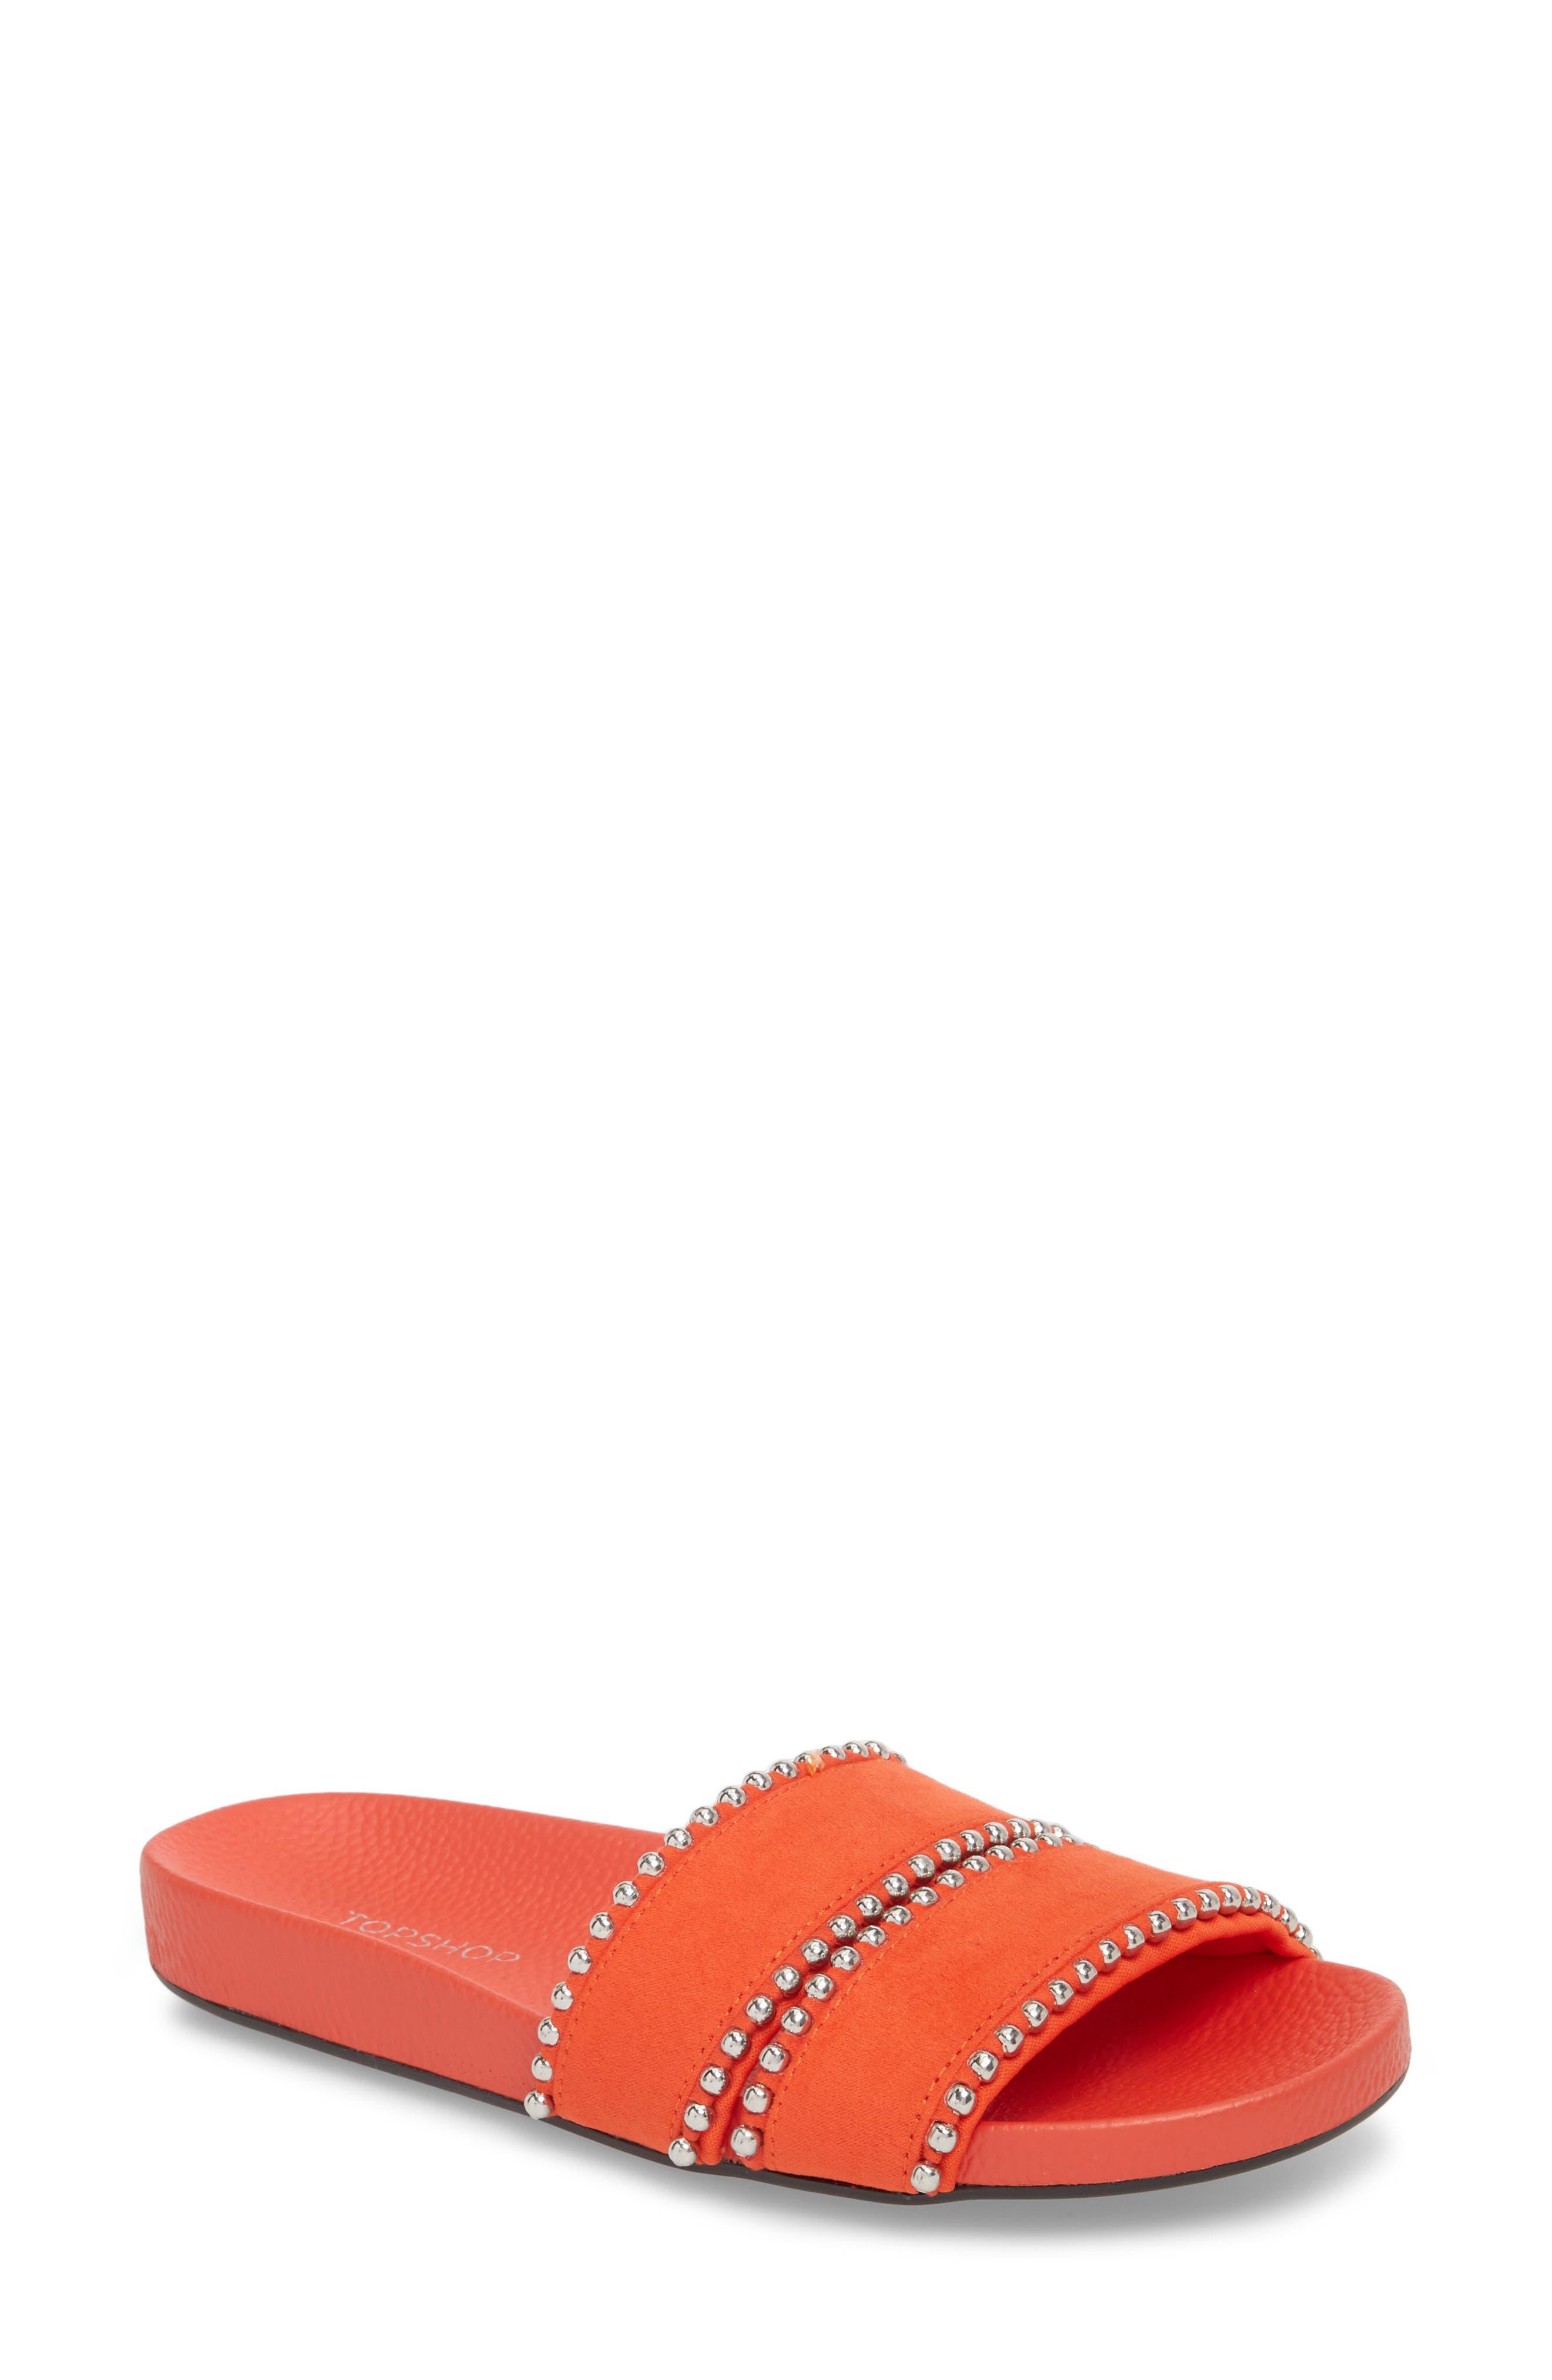 Rascal Studded Slide Sandal,                             Main thumbnail 2, color,